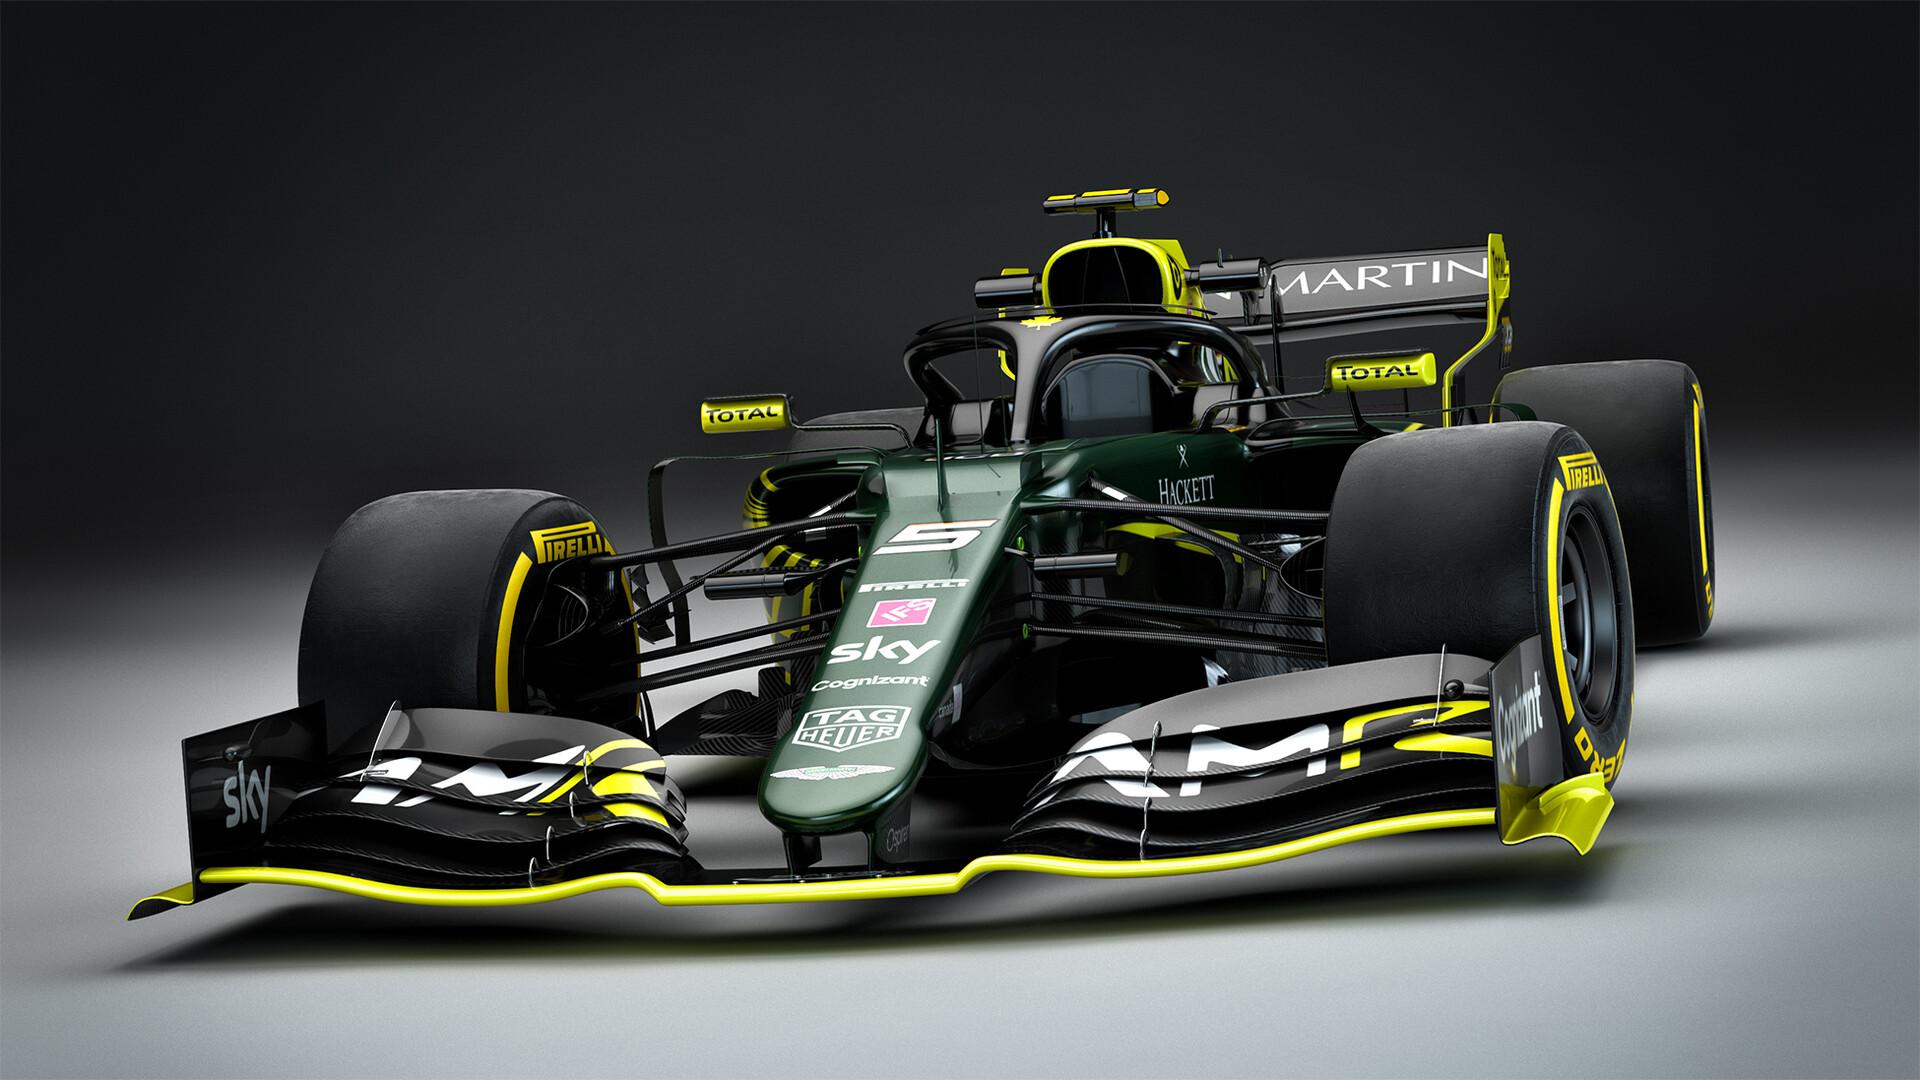 Aston Martin Cognizant F1 Team Background 7